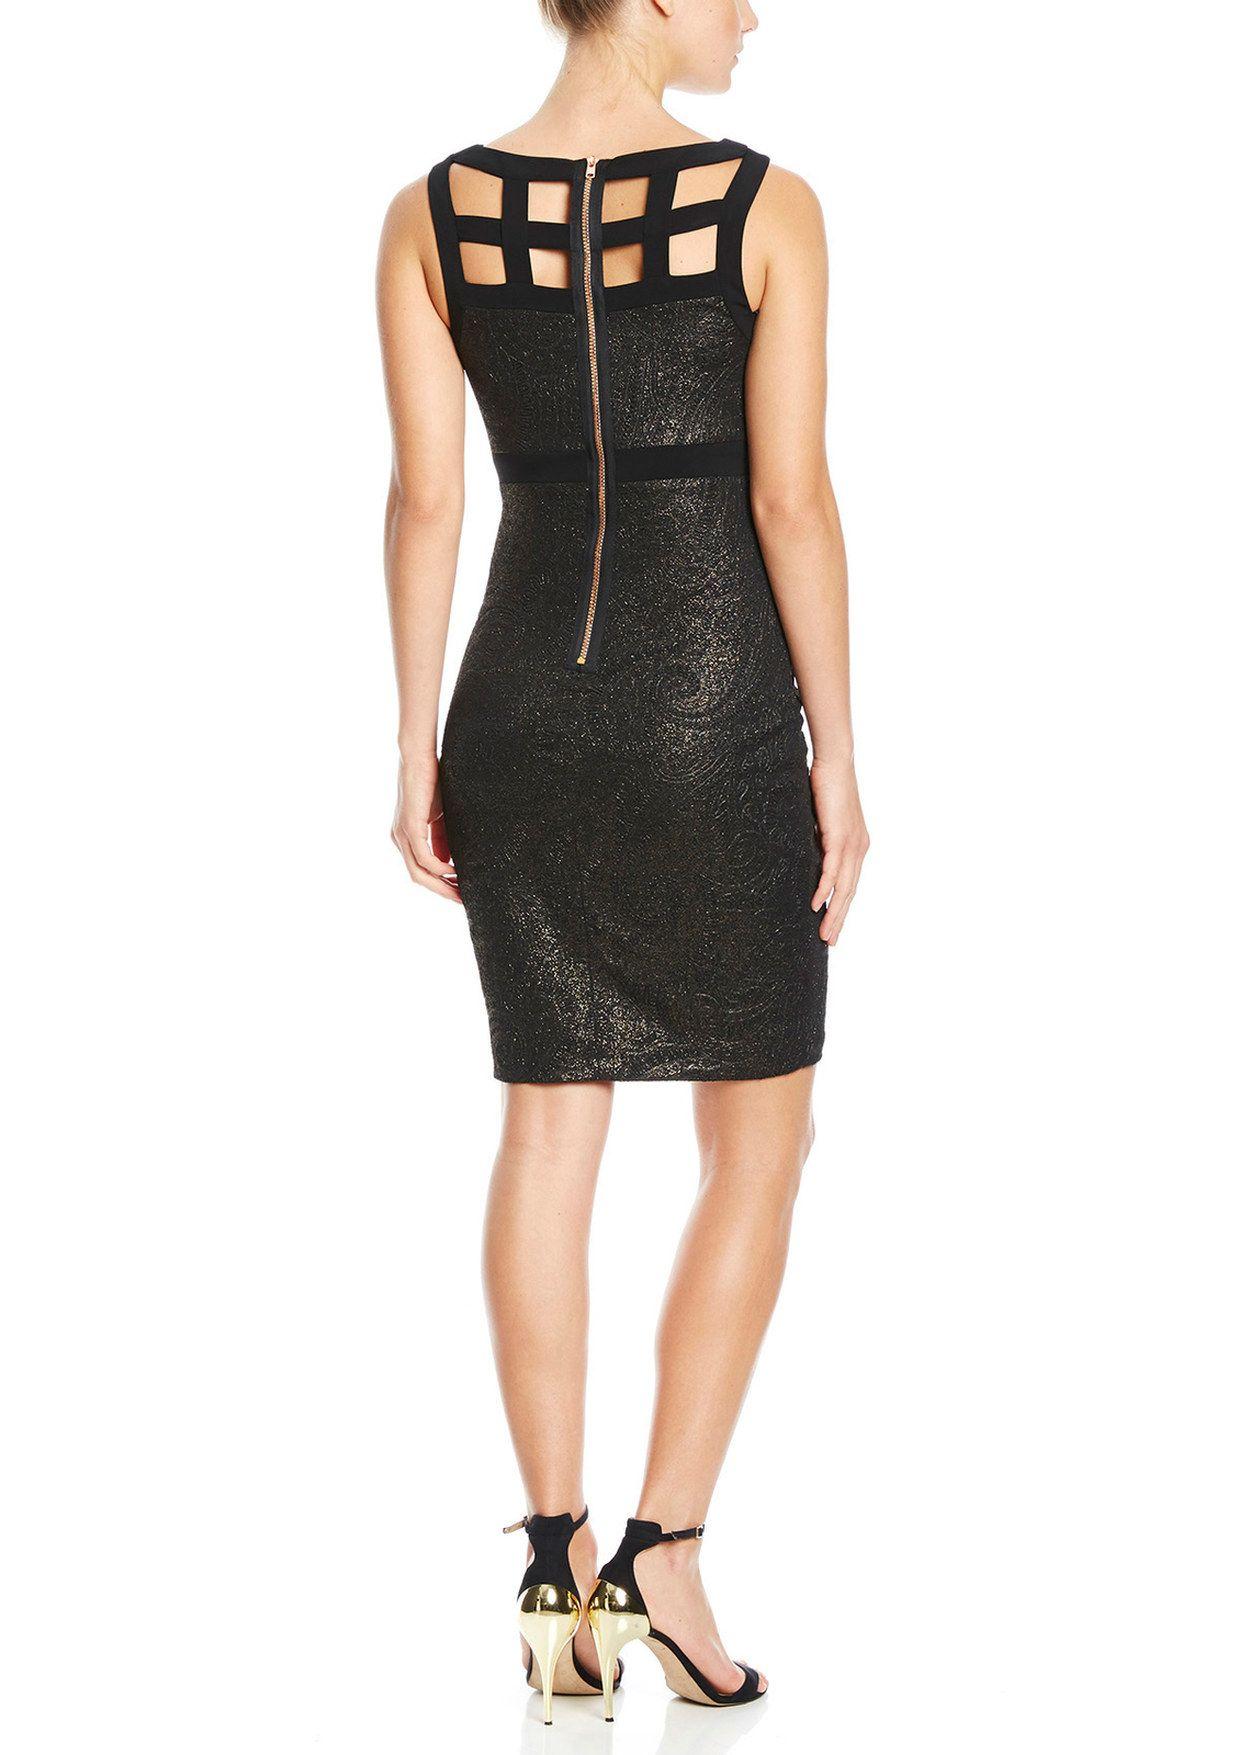 $54.99   JAX Metallic V-Neck Cocktail Dress   ideel.com   big top ...